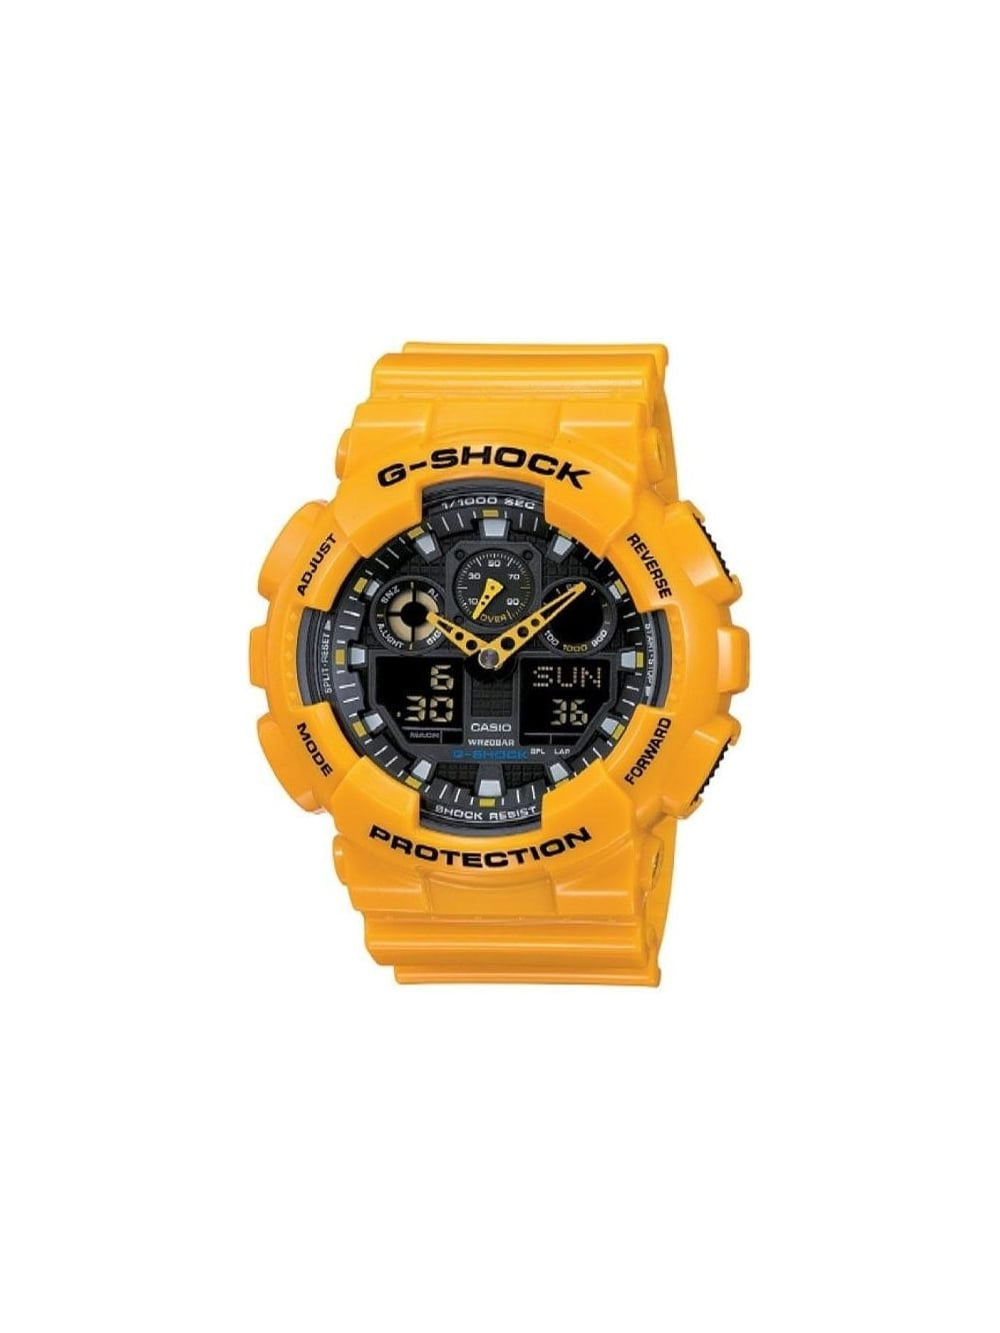 27c65d189 G-Shock - Big Size Combi Watch - Orange - G-Shock watches at ...